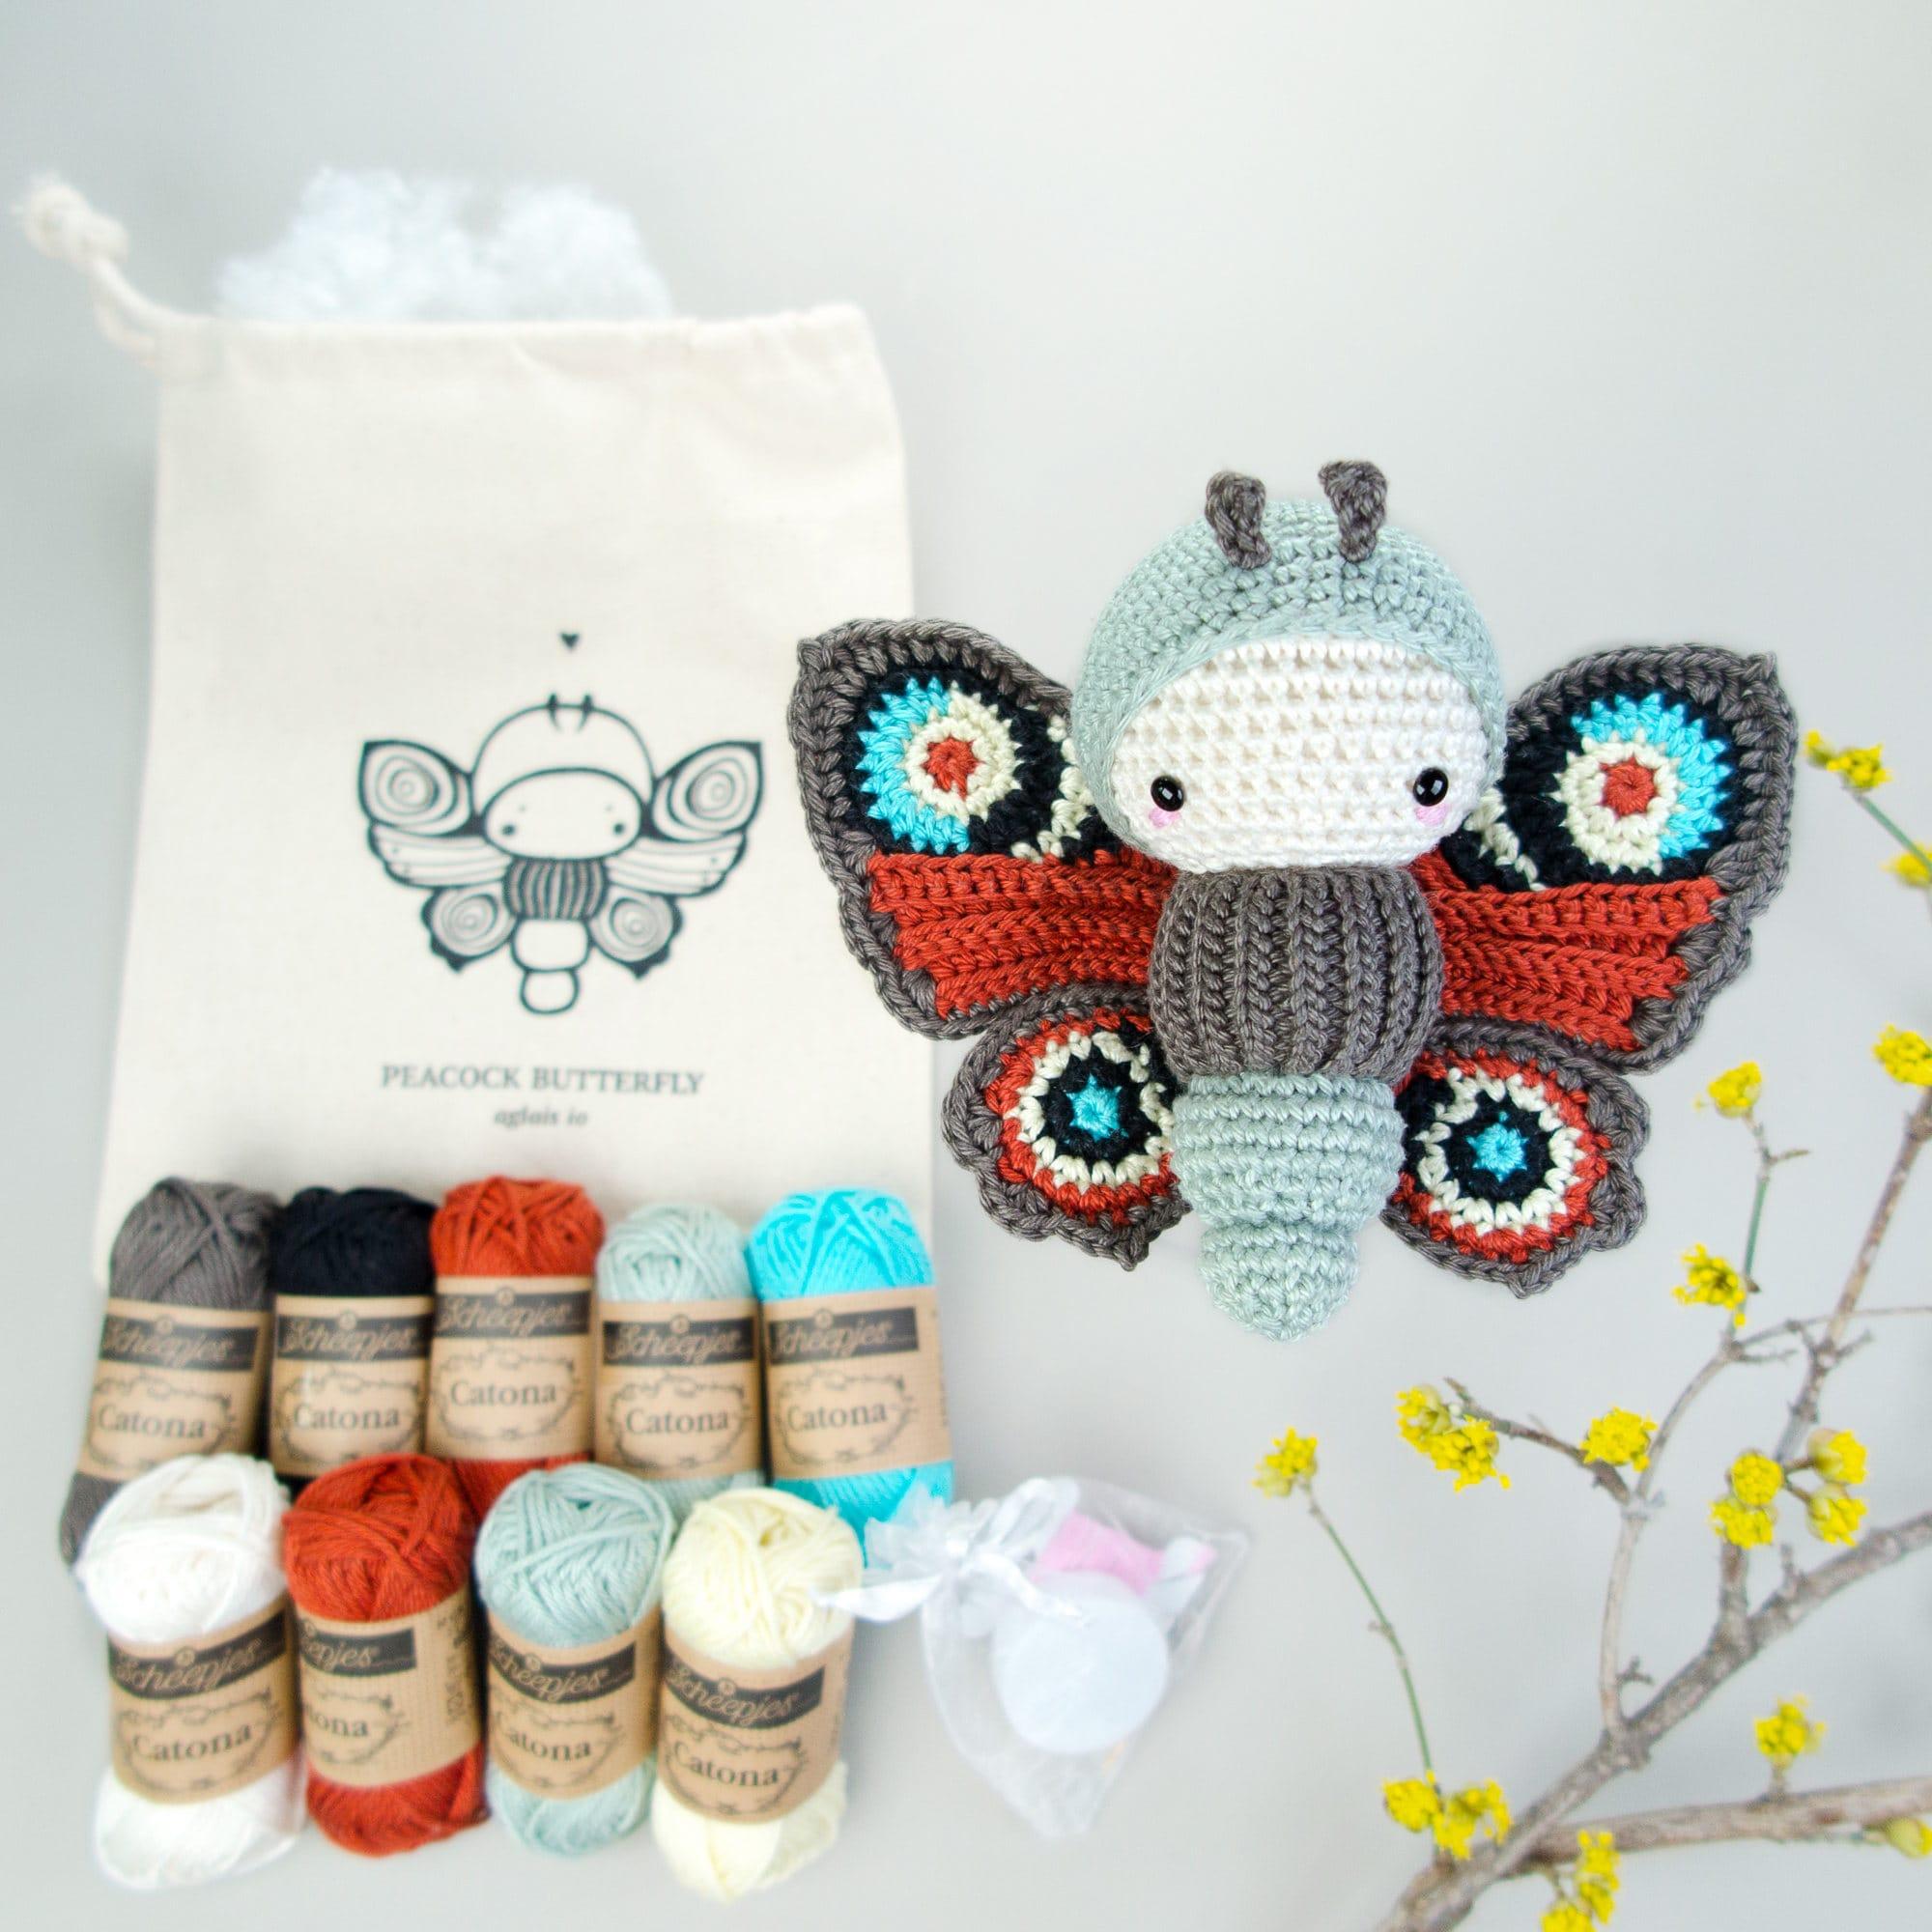 Crochet Kit lalylala bugs Peacock butterfly materials | Etsy